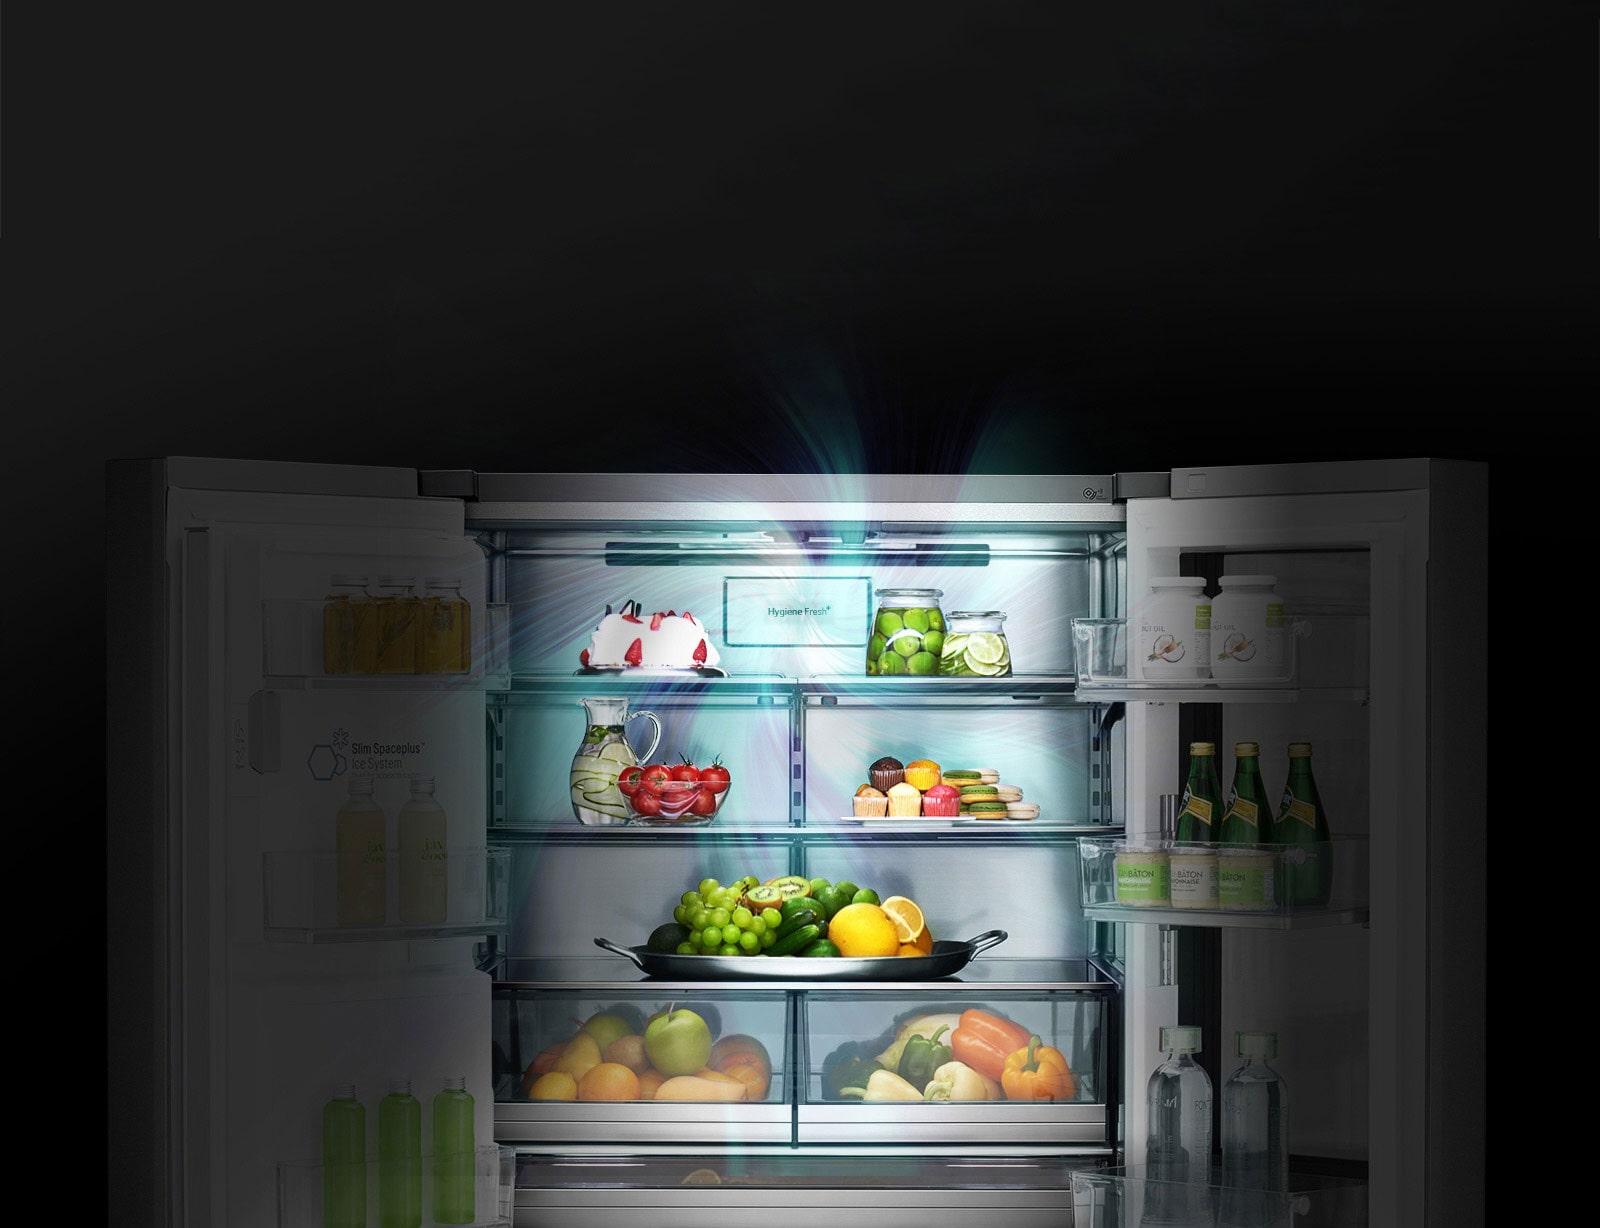 Signature-HygieneFresh-Refrigerator_D1